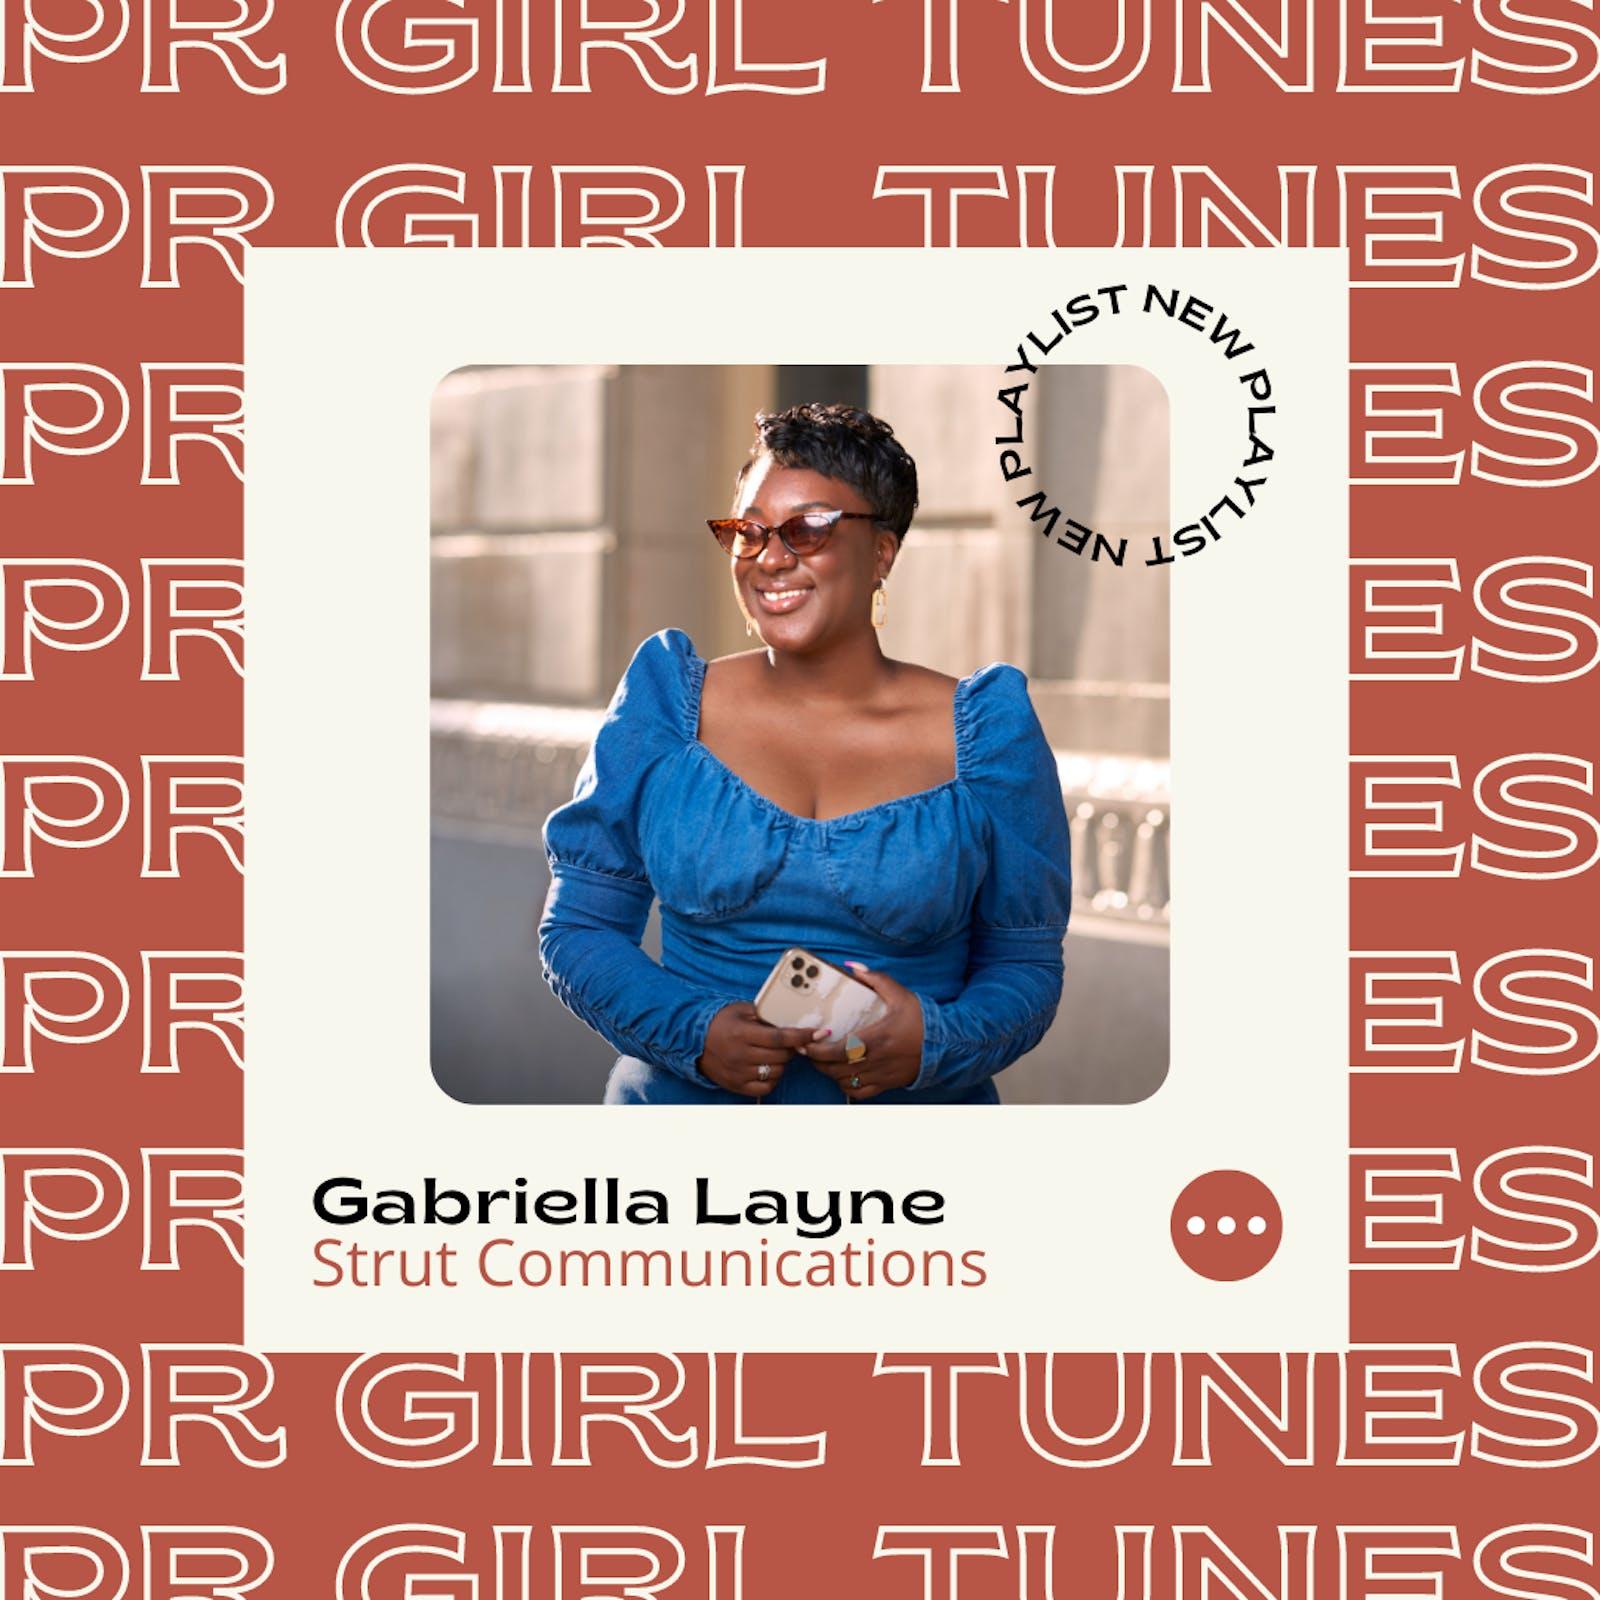 Check out the latest PR Girl Tunes w/ Gabriella Layne